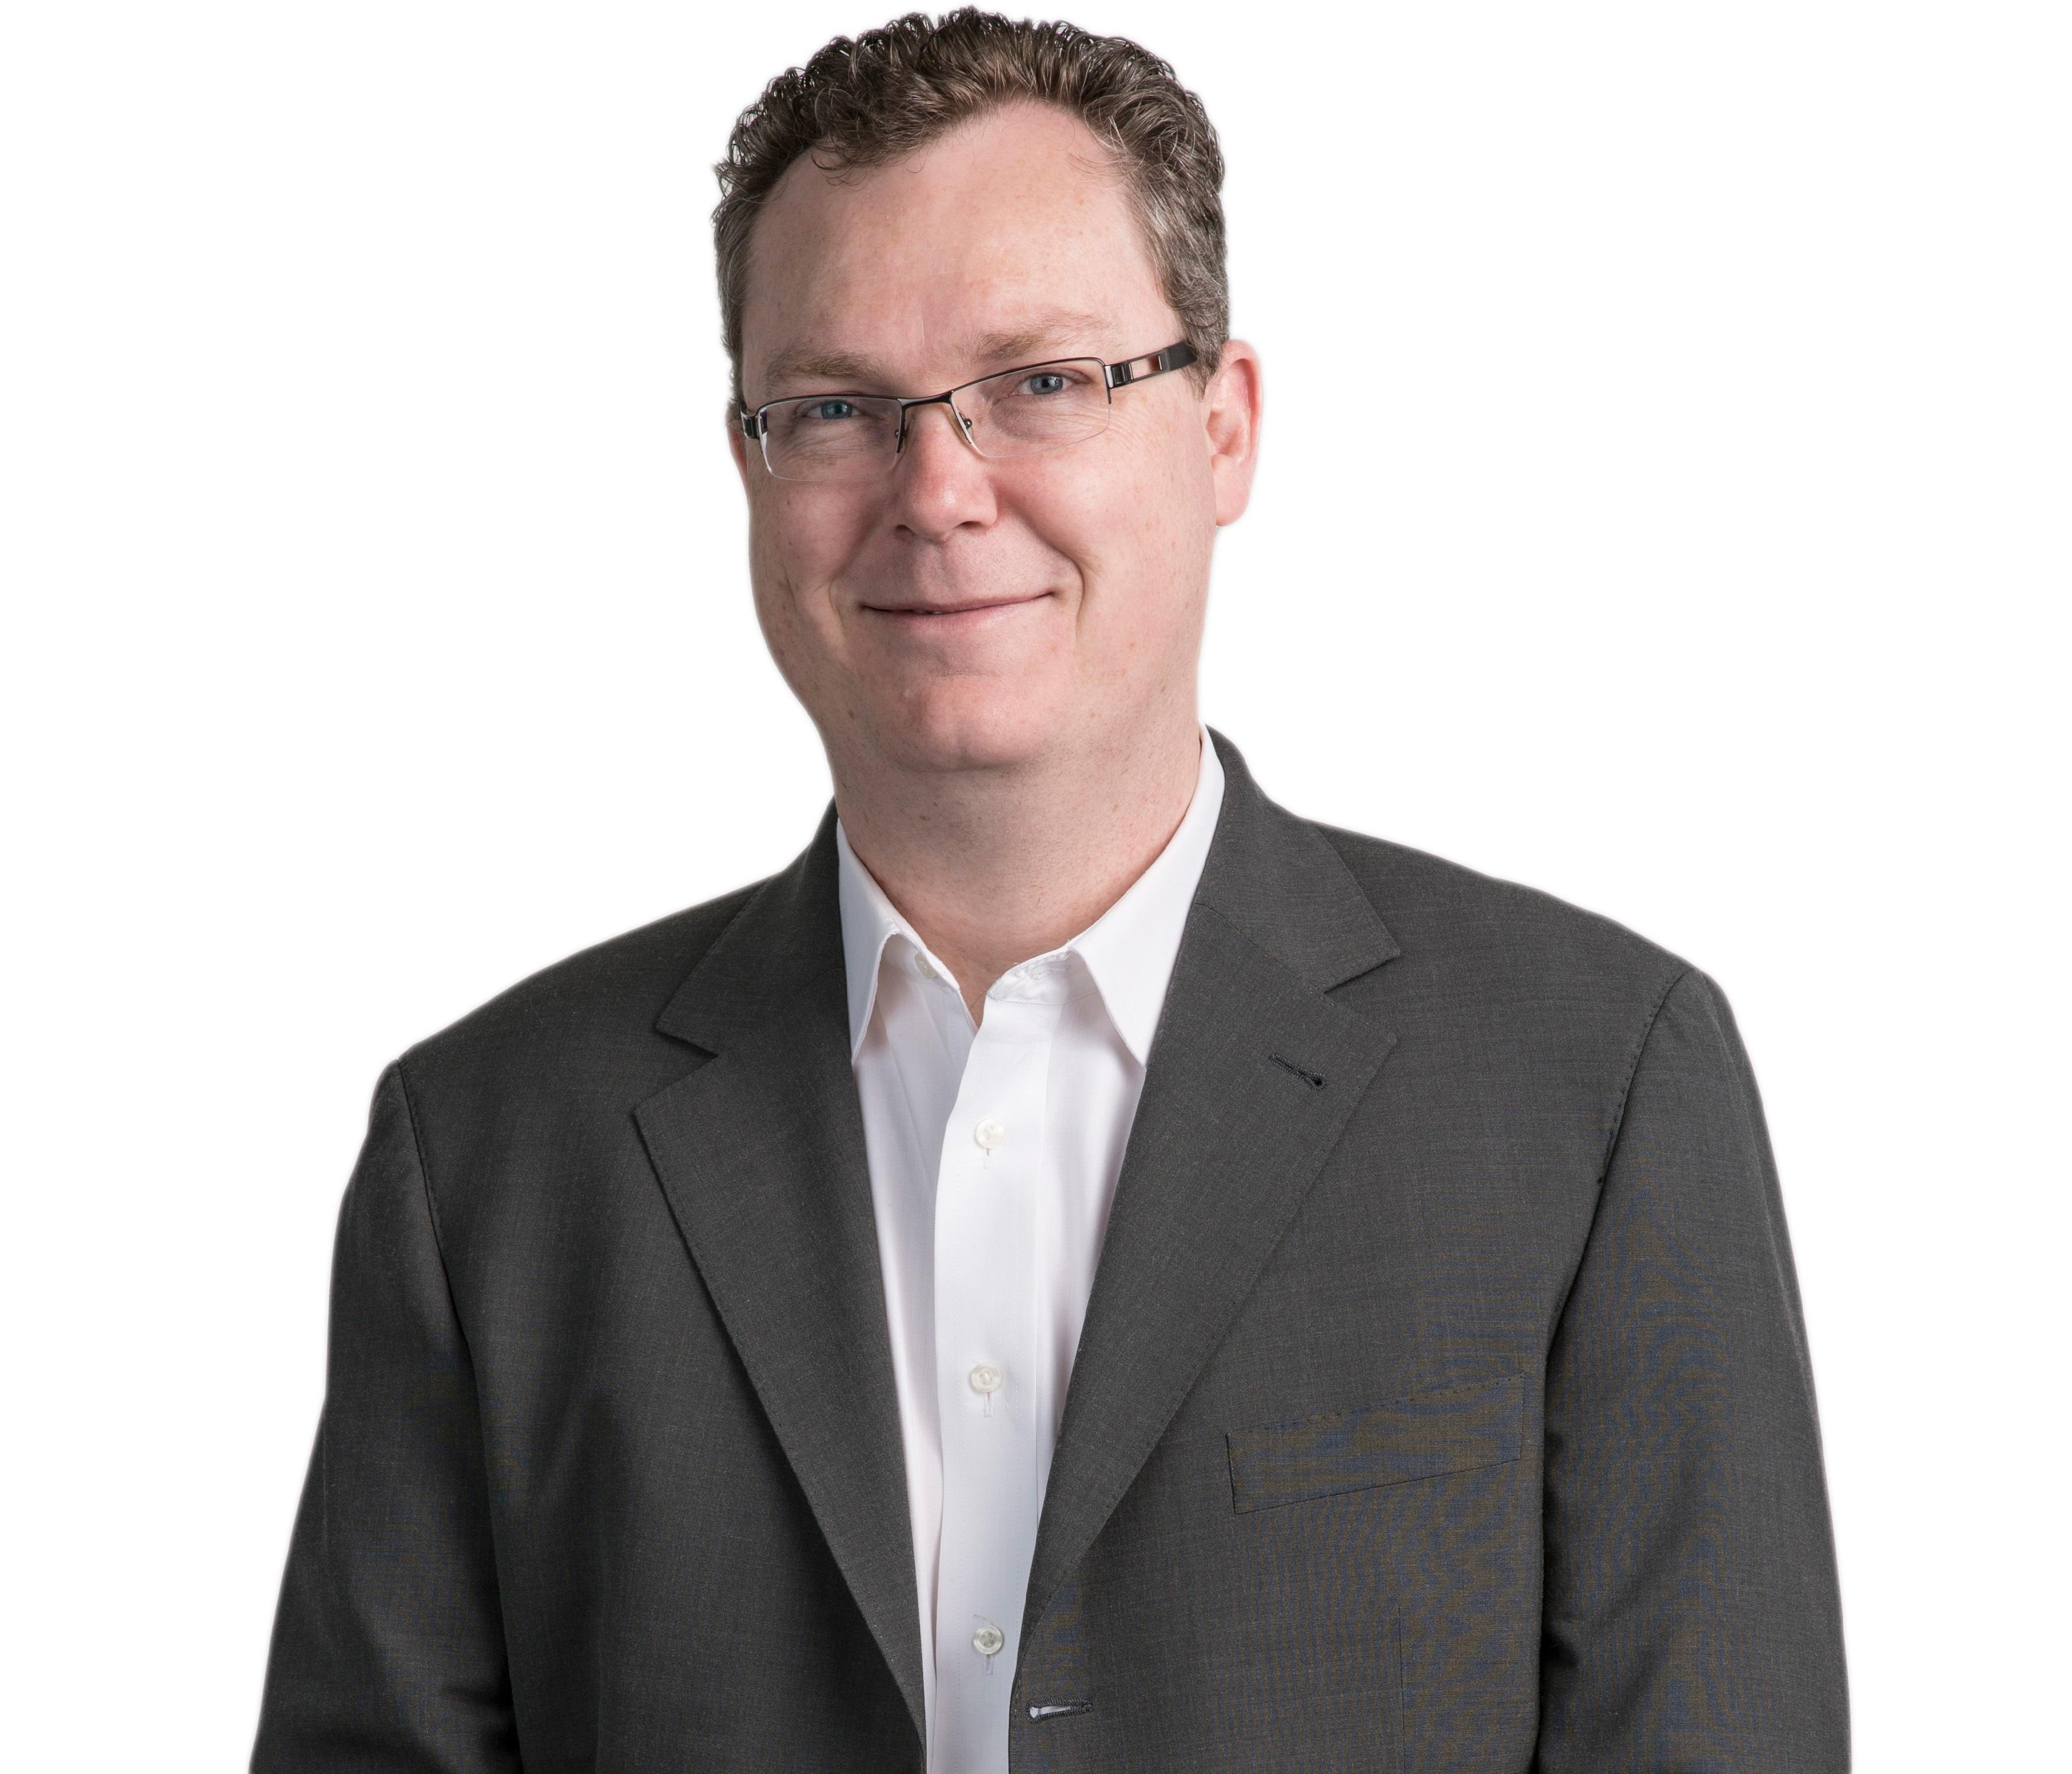 Günther Ollmann, CSO, Vectra Netwerks